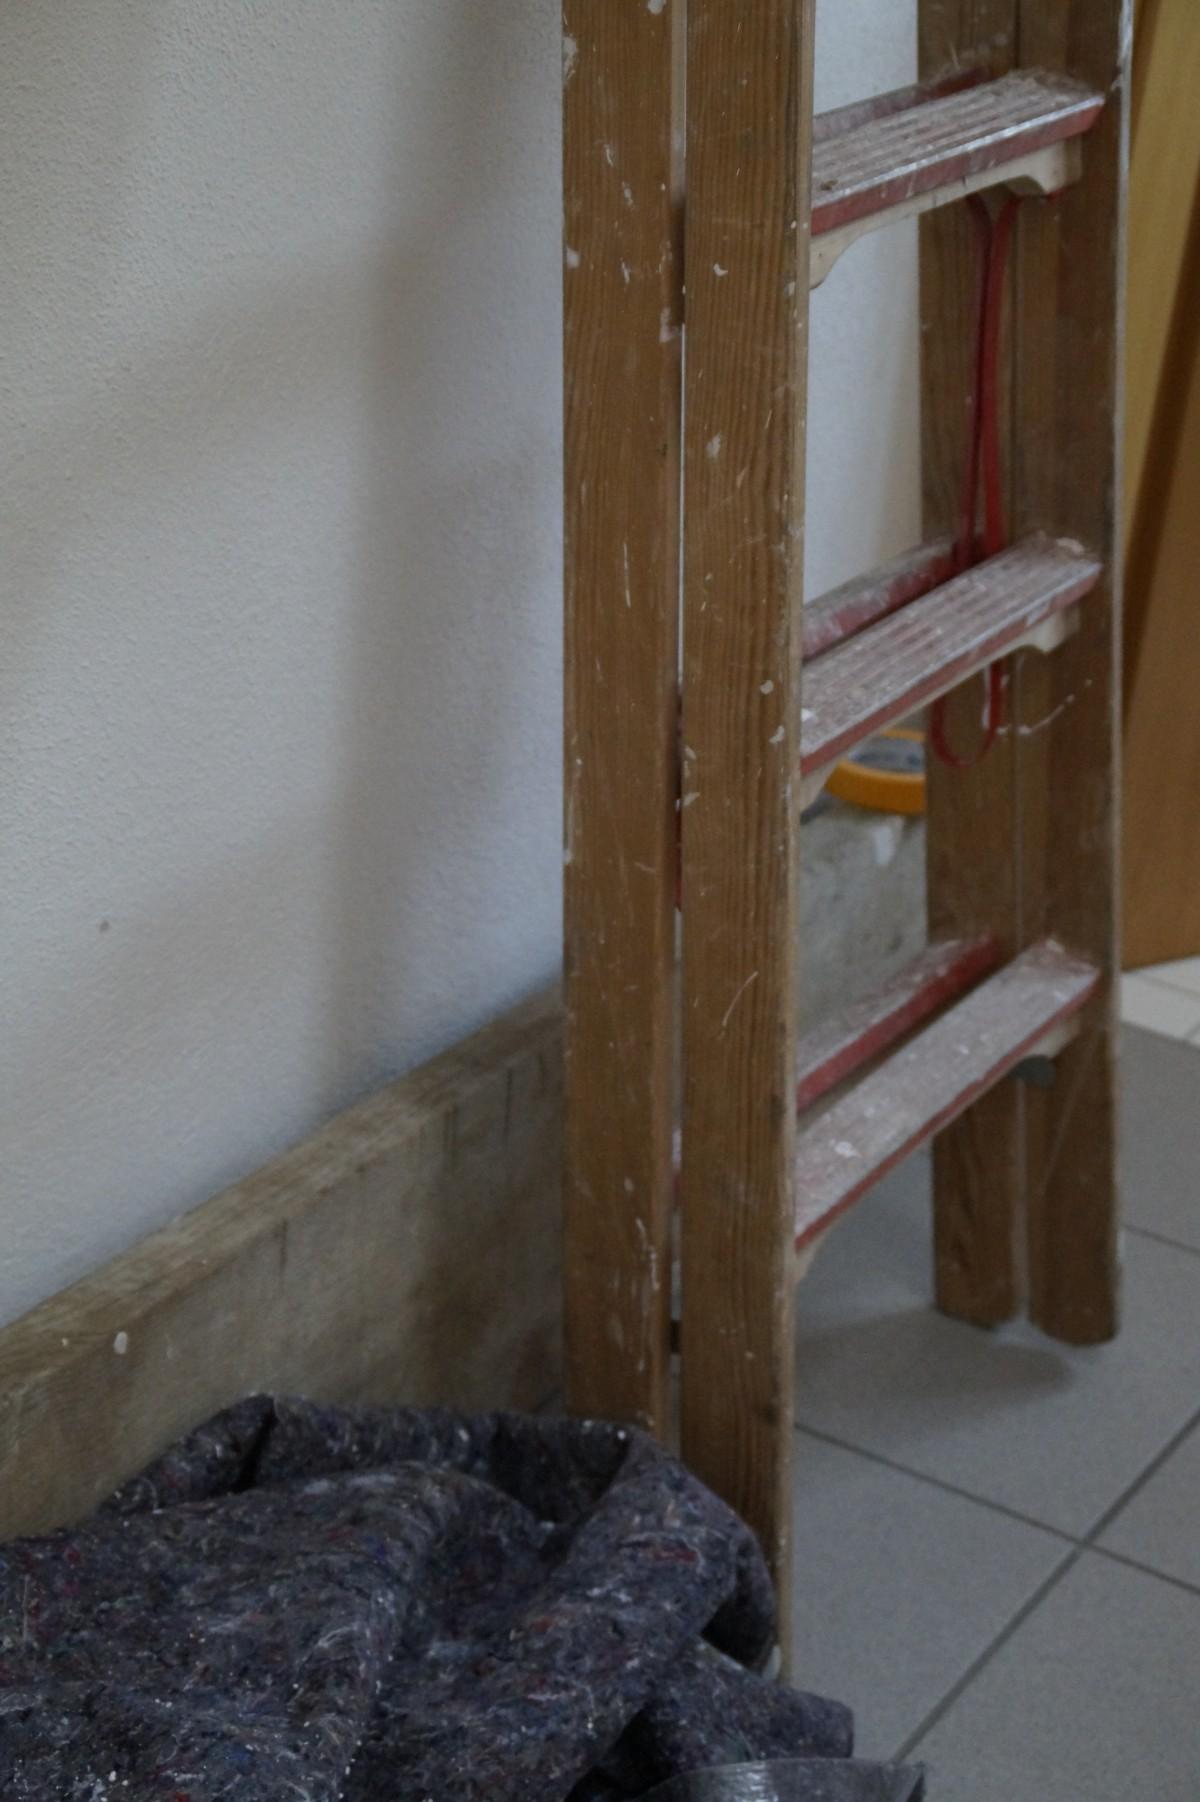 work wood floor building wall furniture - Furniture Painter